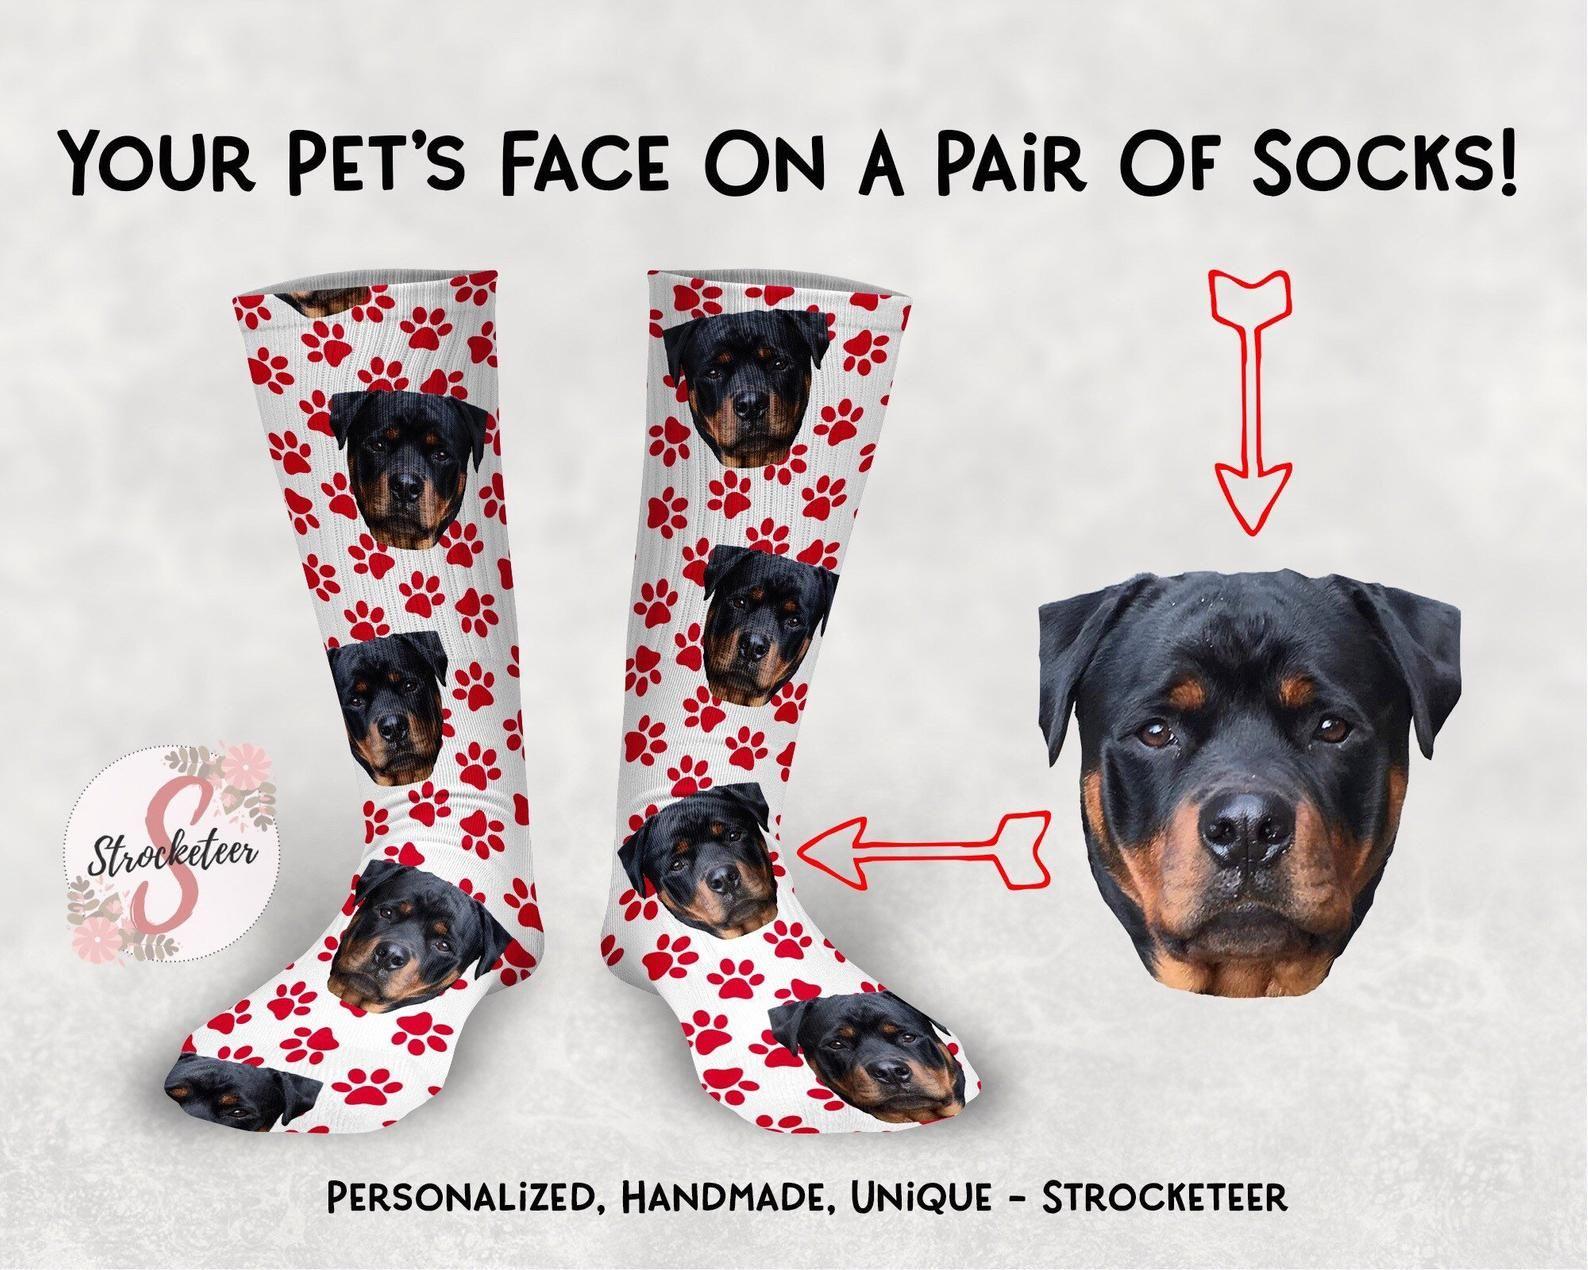 Customized Pet Face Socks With Paw Print Design Custom